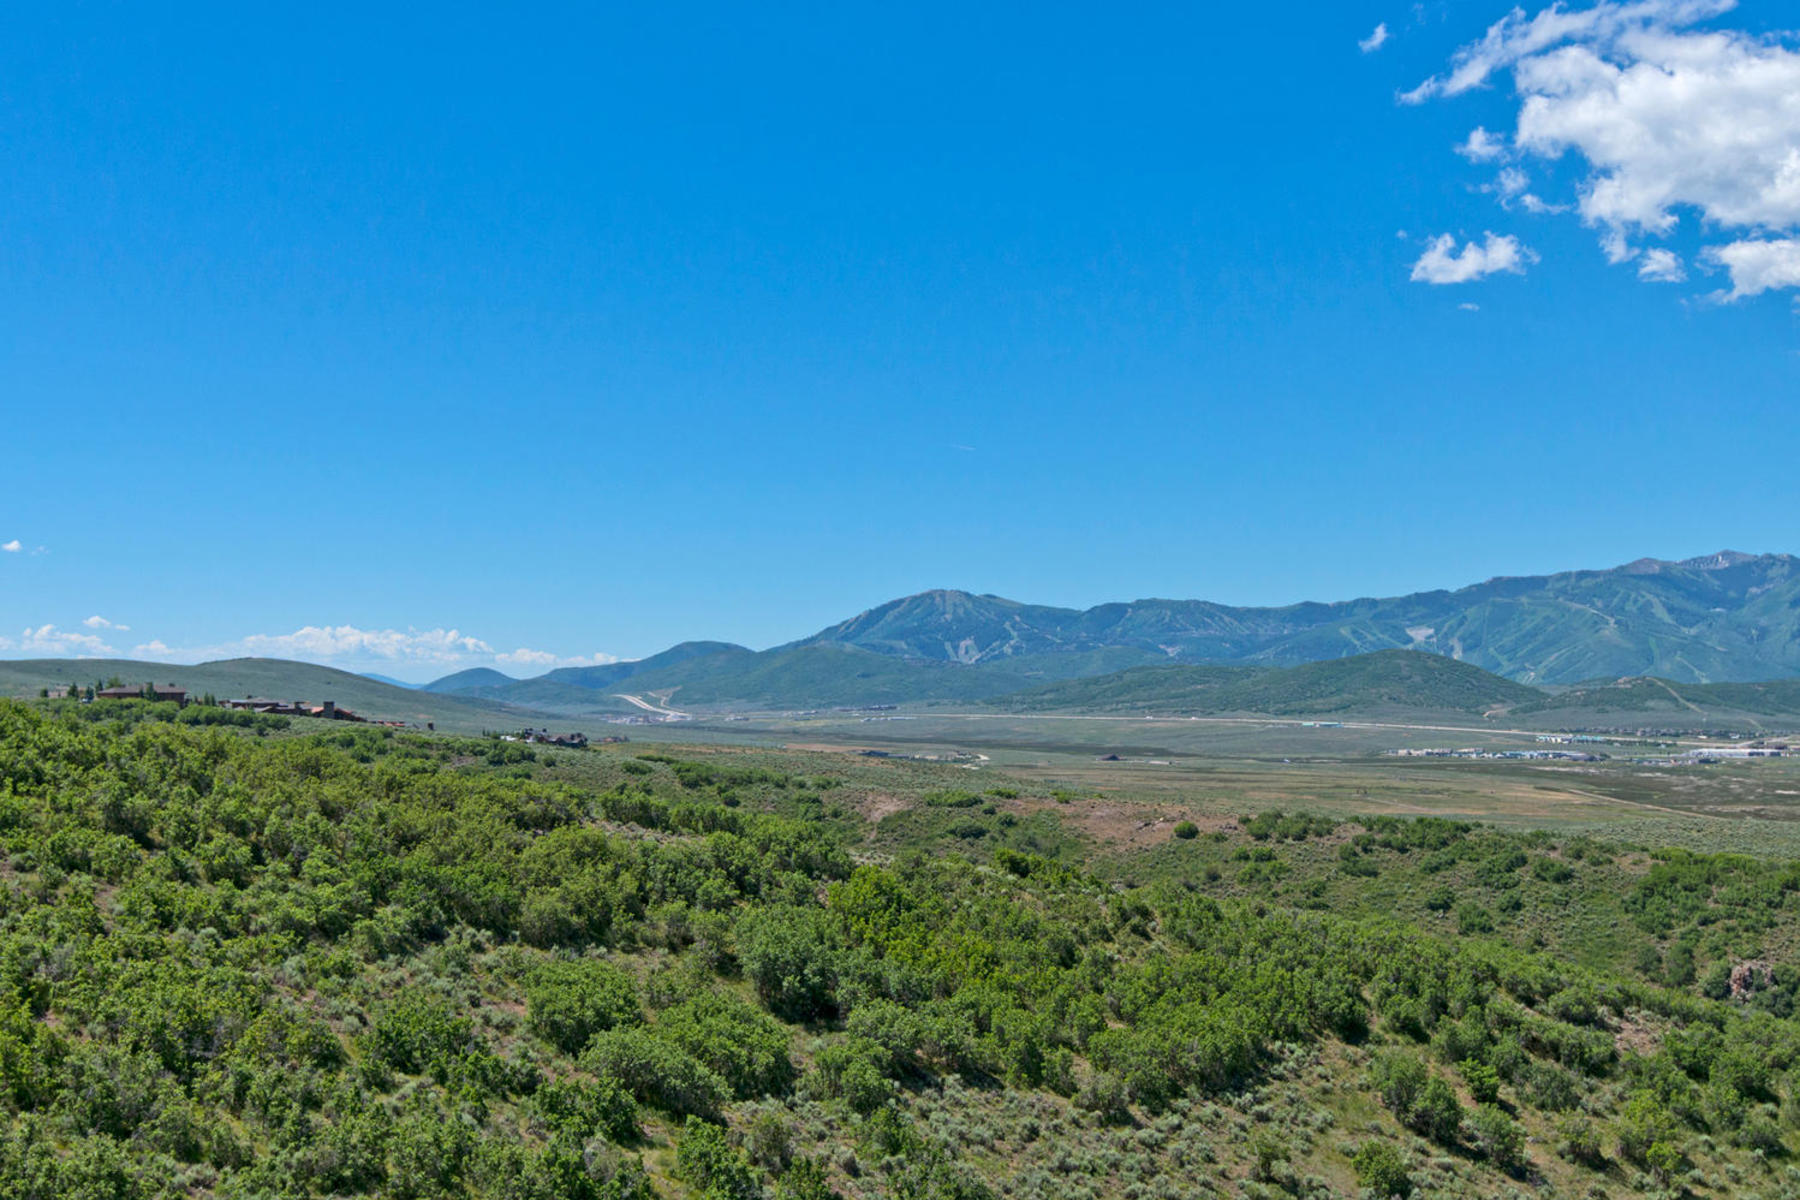 Terreno para Venda às Amazing Promontory Lot Backing to Open Space 2380 Canyon Gate Rd Lot 78 Park City, Utah, 84098 Estados Unidos